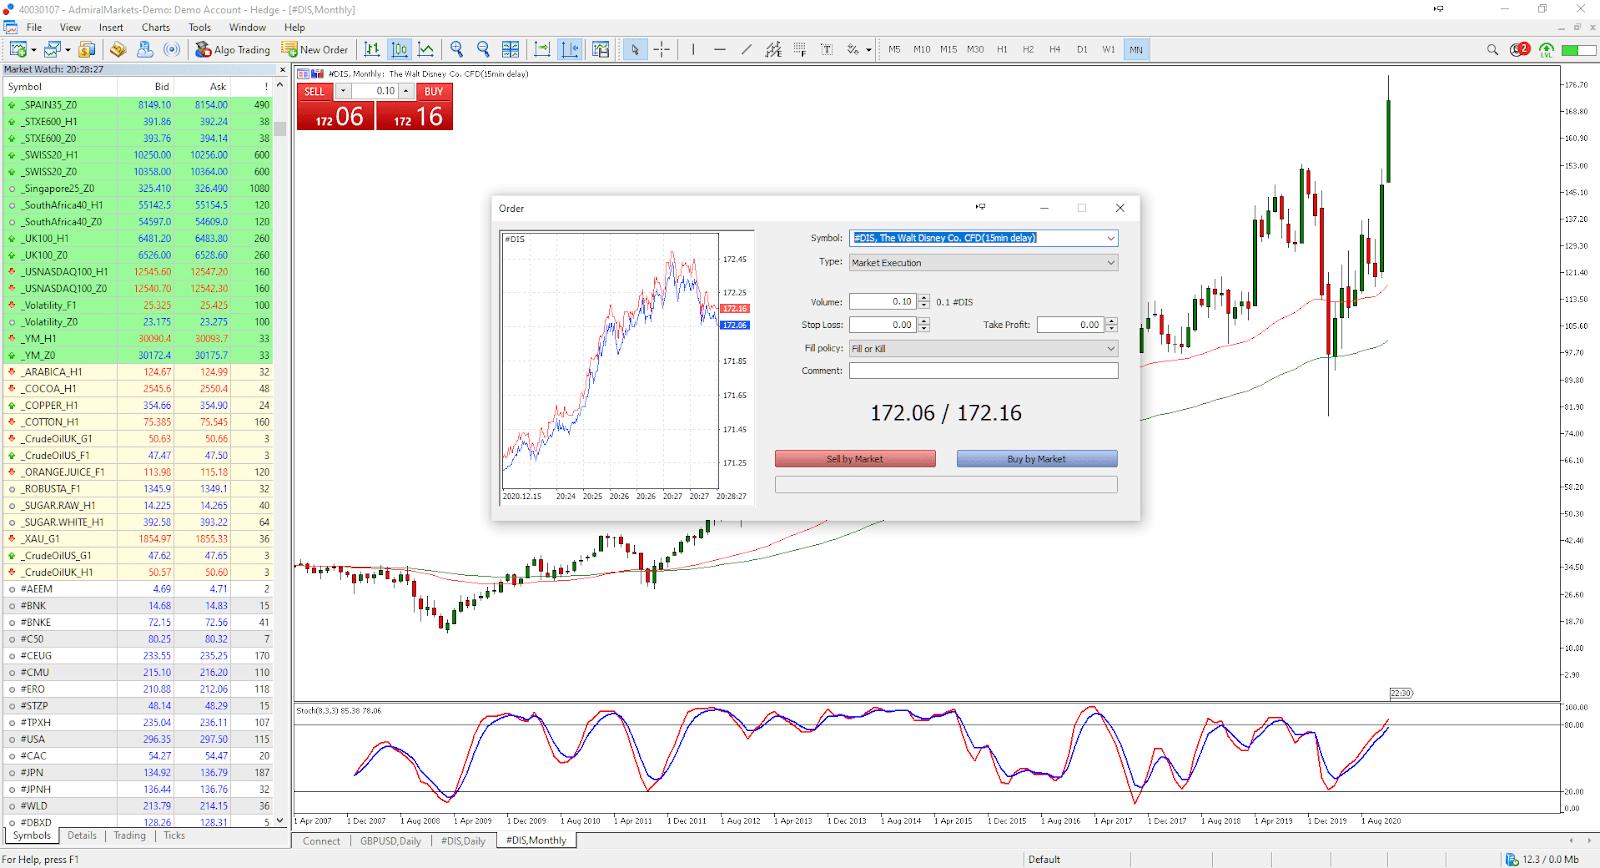 Nákup akcií Admiral Markets